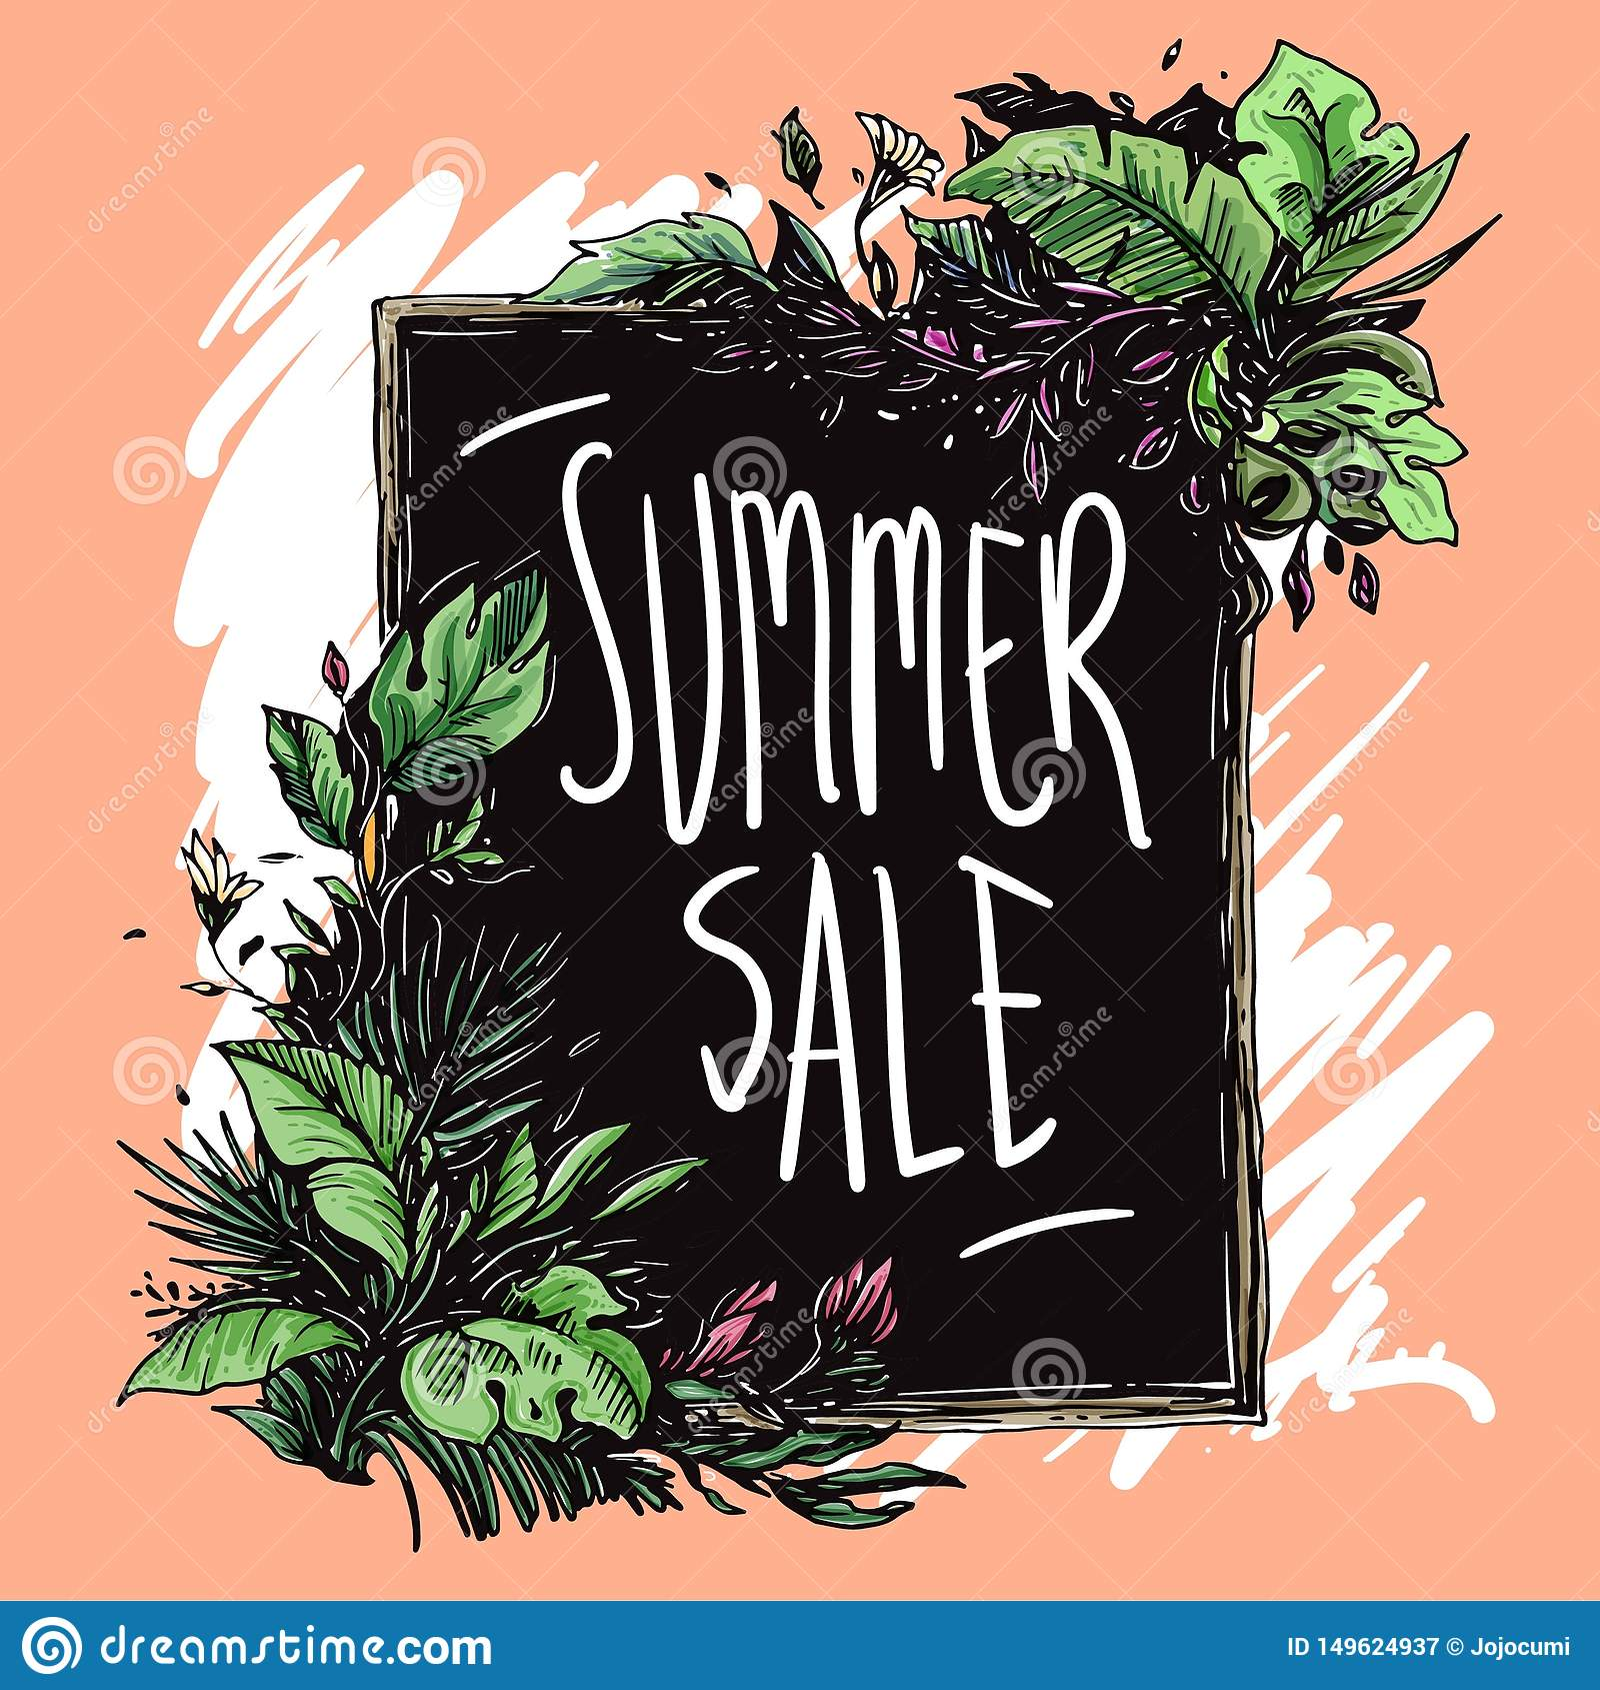 Summer sale floral frame hand drawn